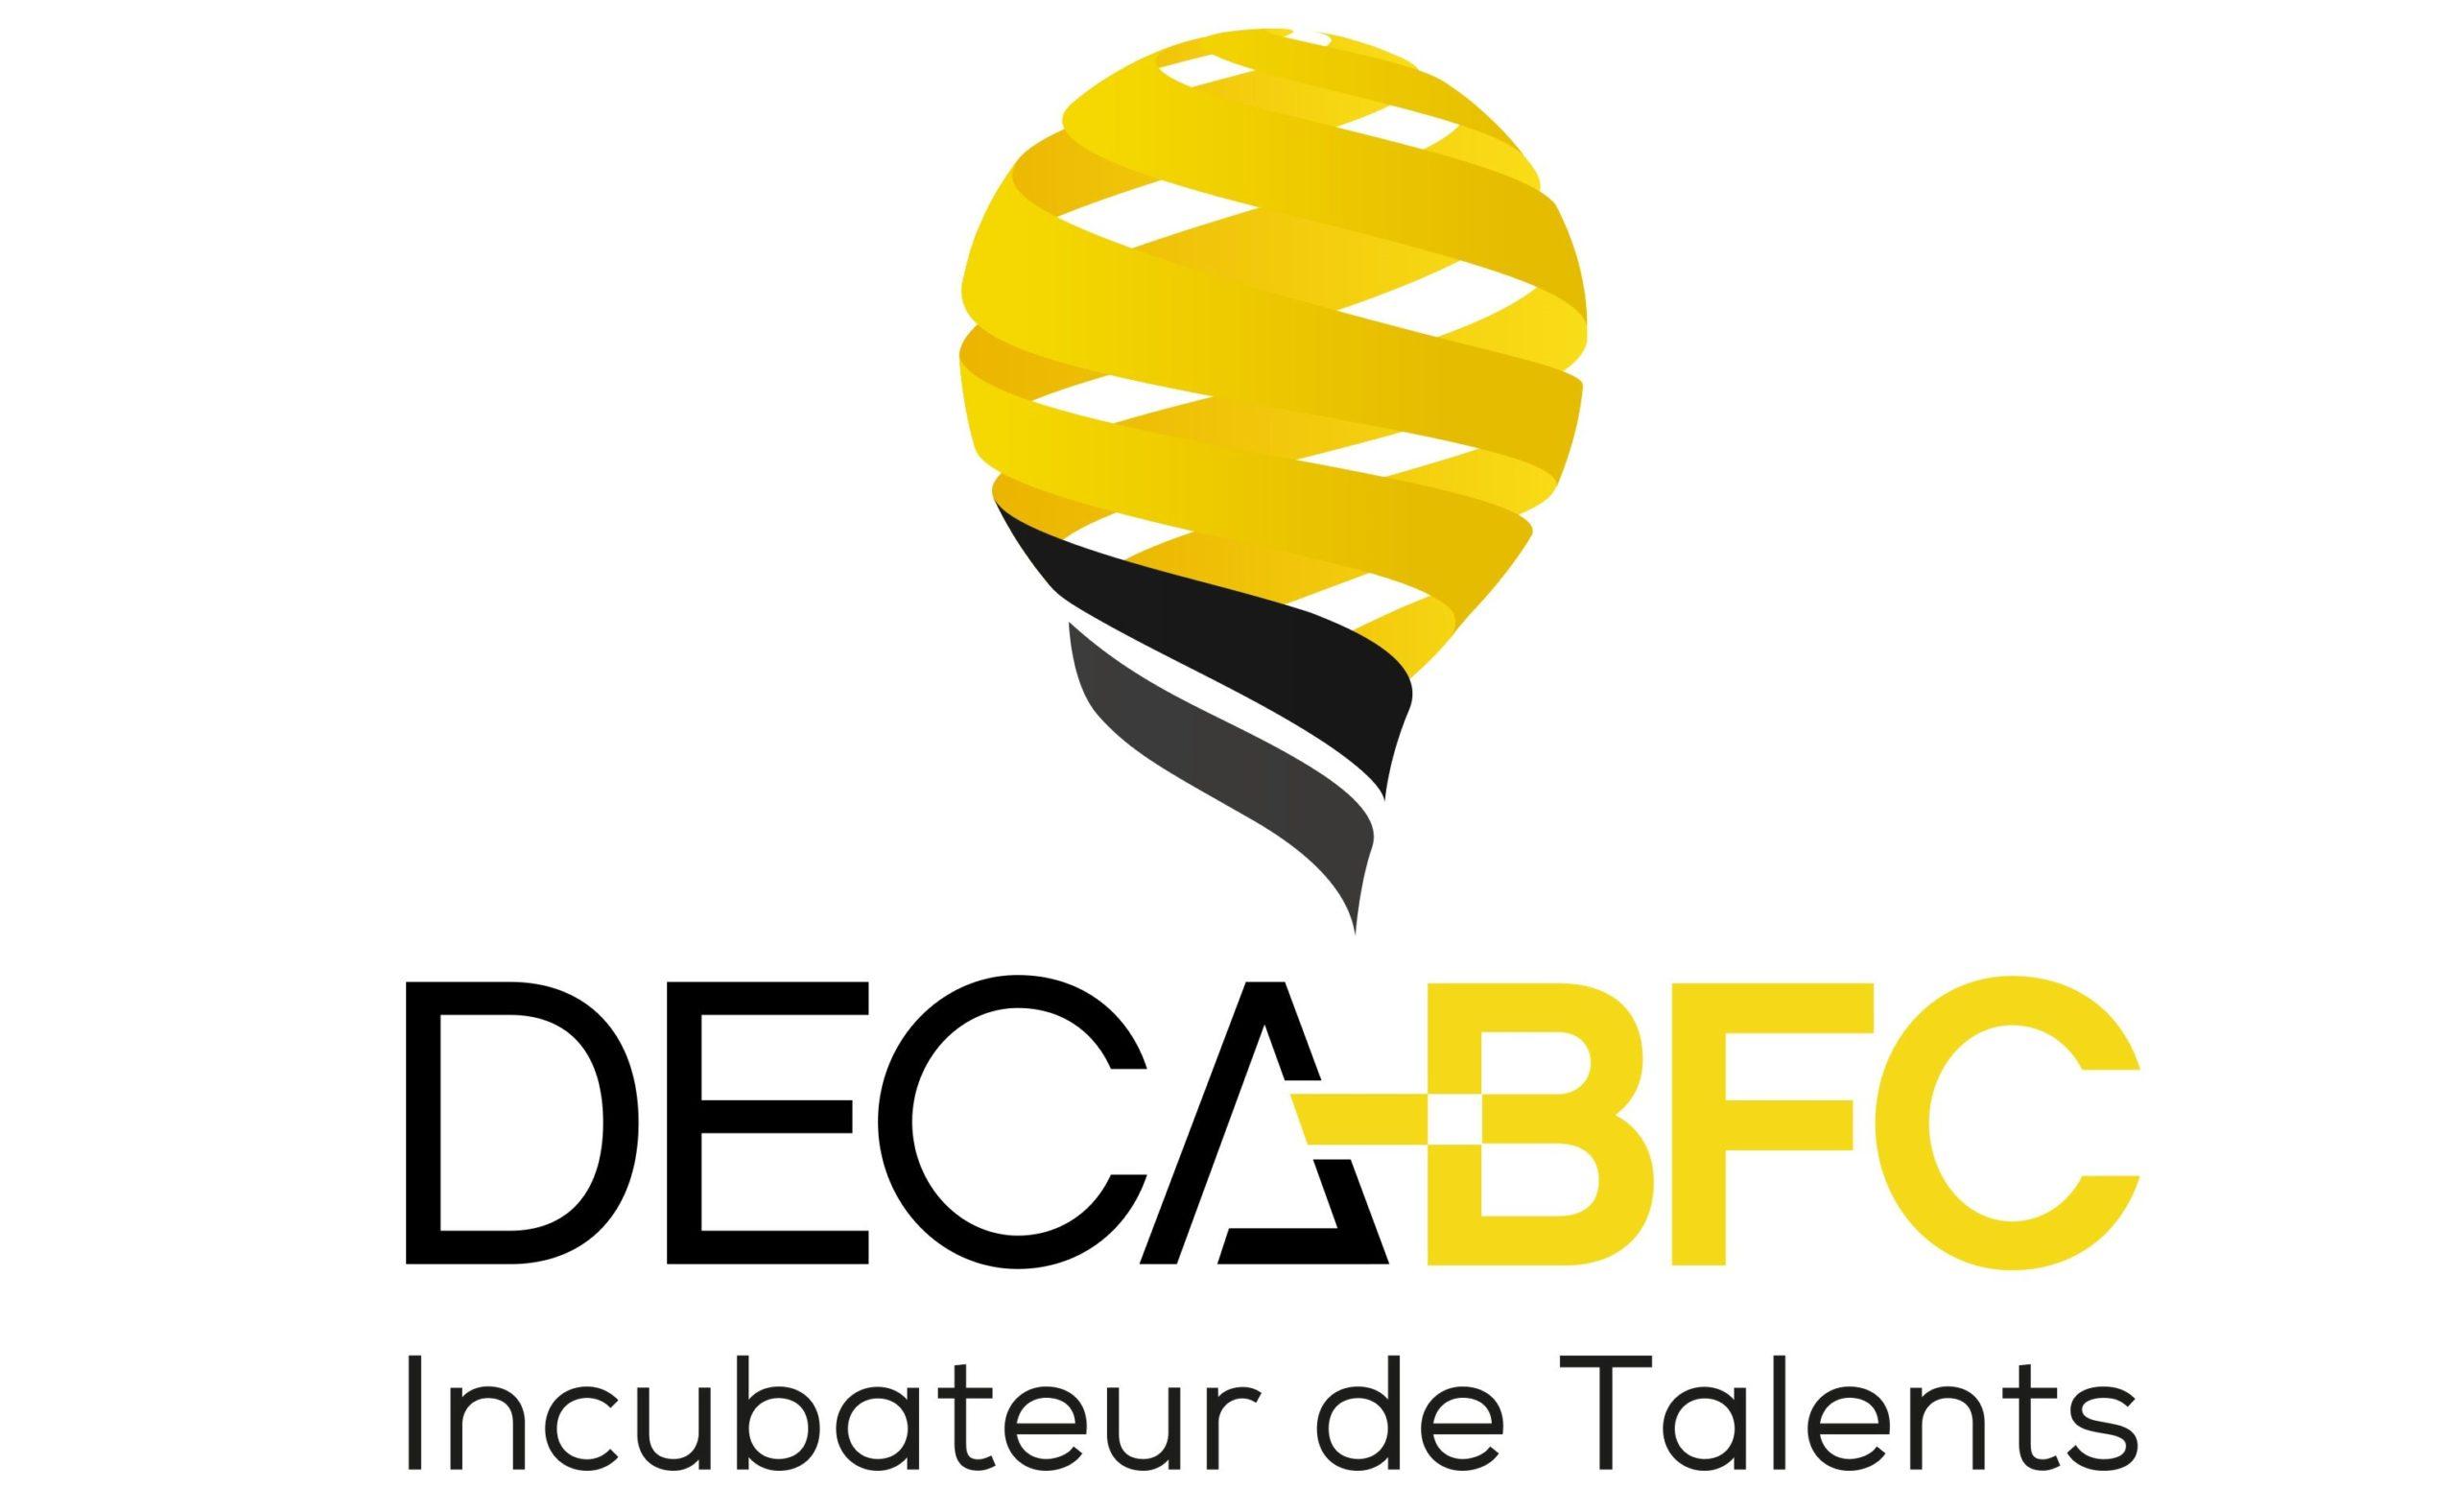 DECA-BFC: Appel à Projets « START-UP INDUSTRIE 4.0 »